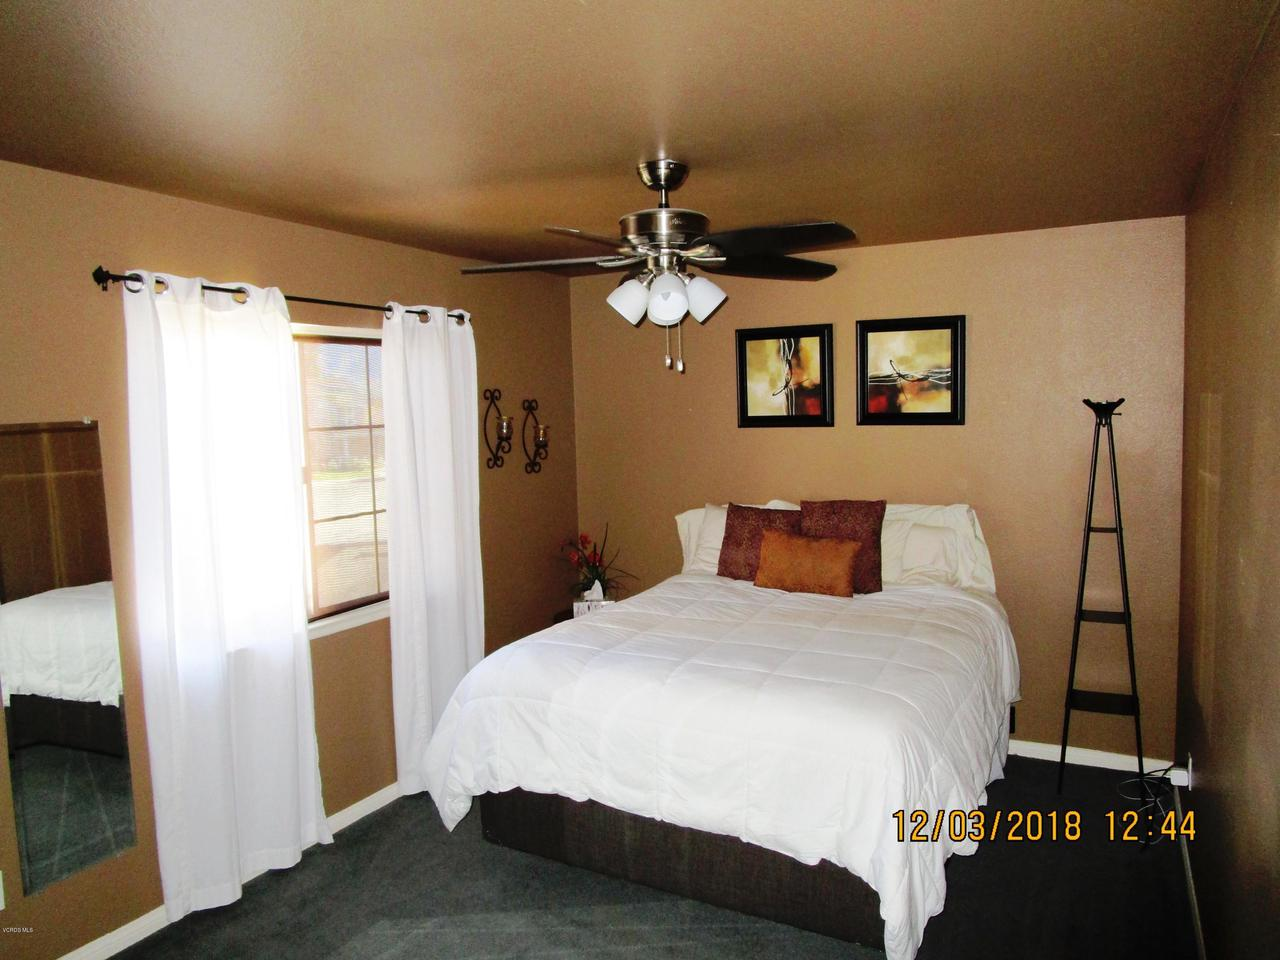 1063 MEADOWLARK, Fillmore, CA 93015 - bed 3